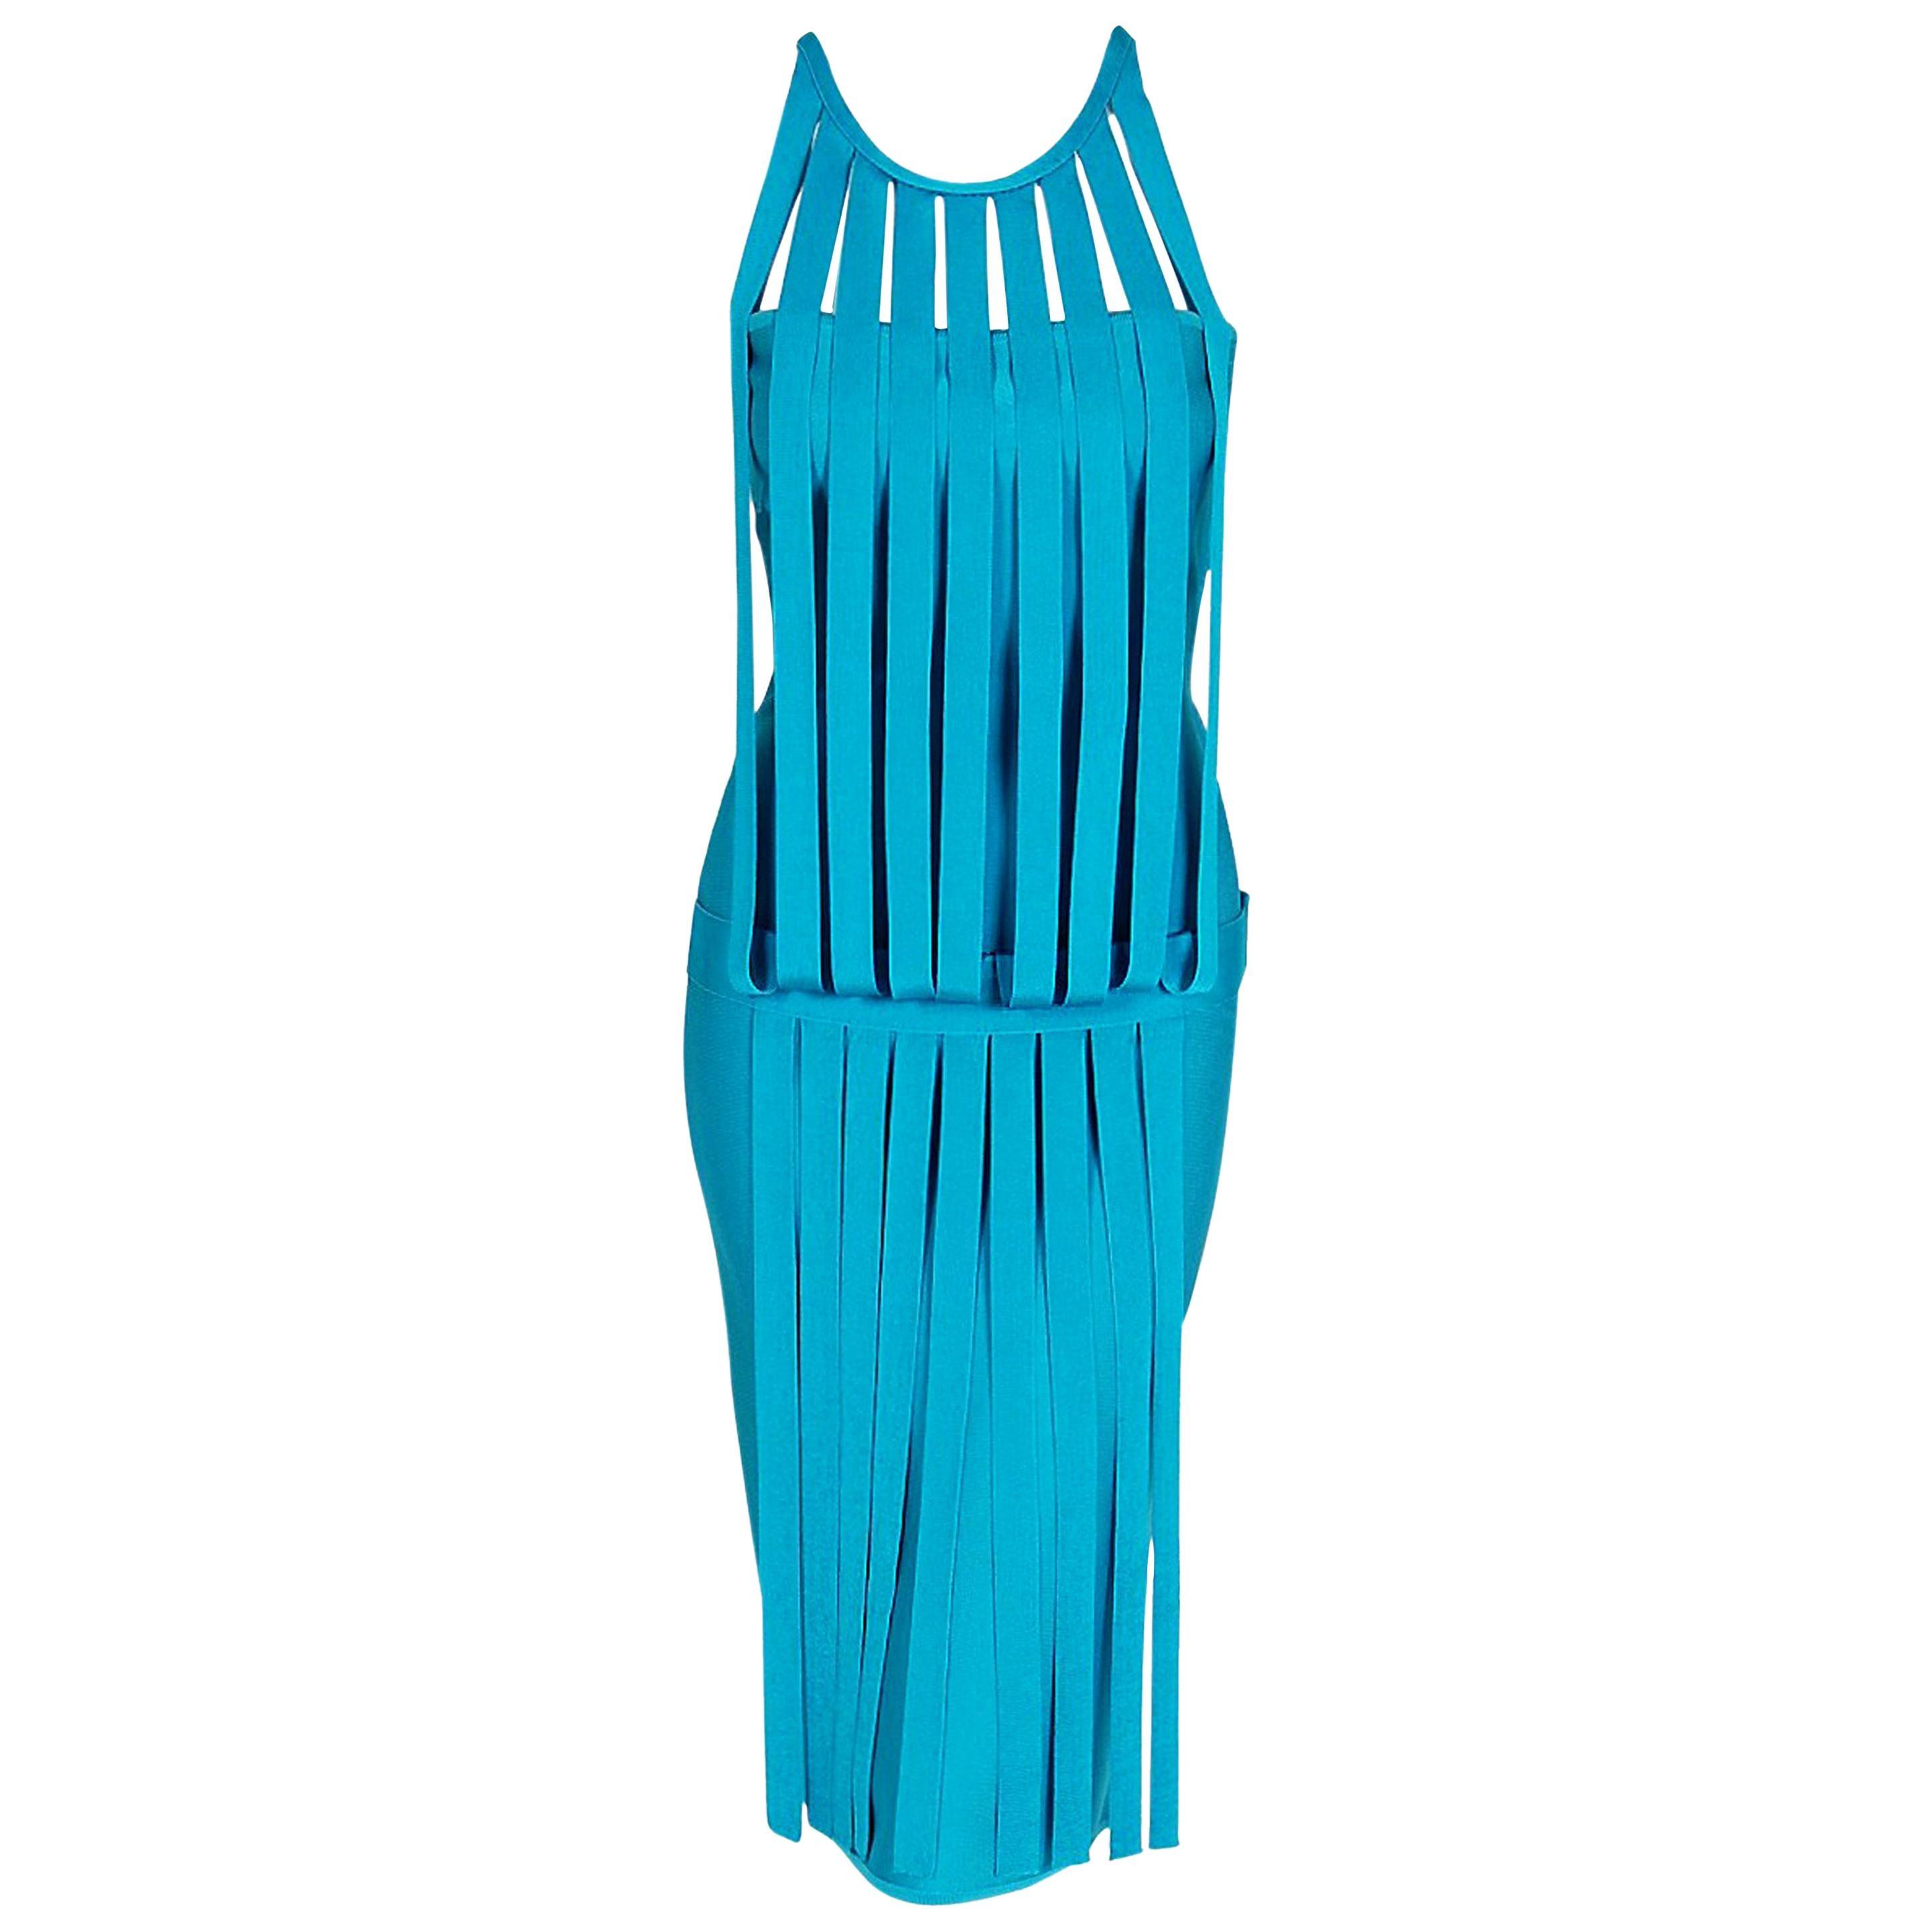 Vintage 1990's Herve Leger Runway Turquoise Blue Knit Birdcage Bodycon Dress